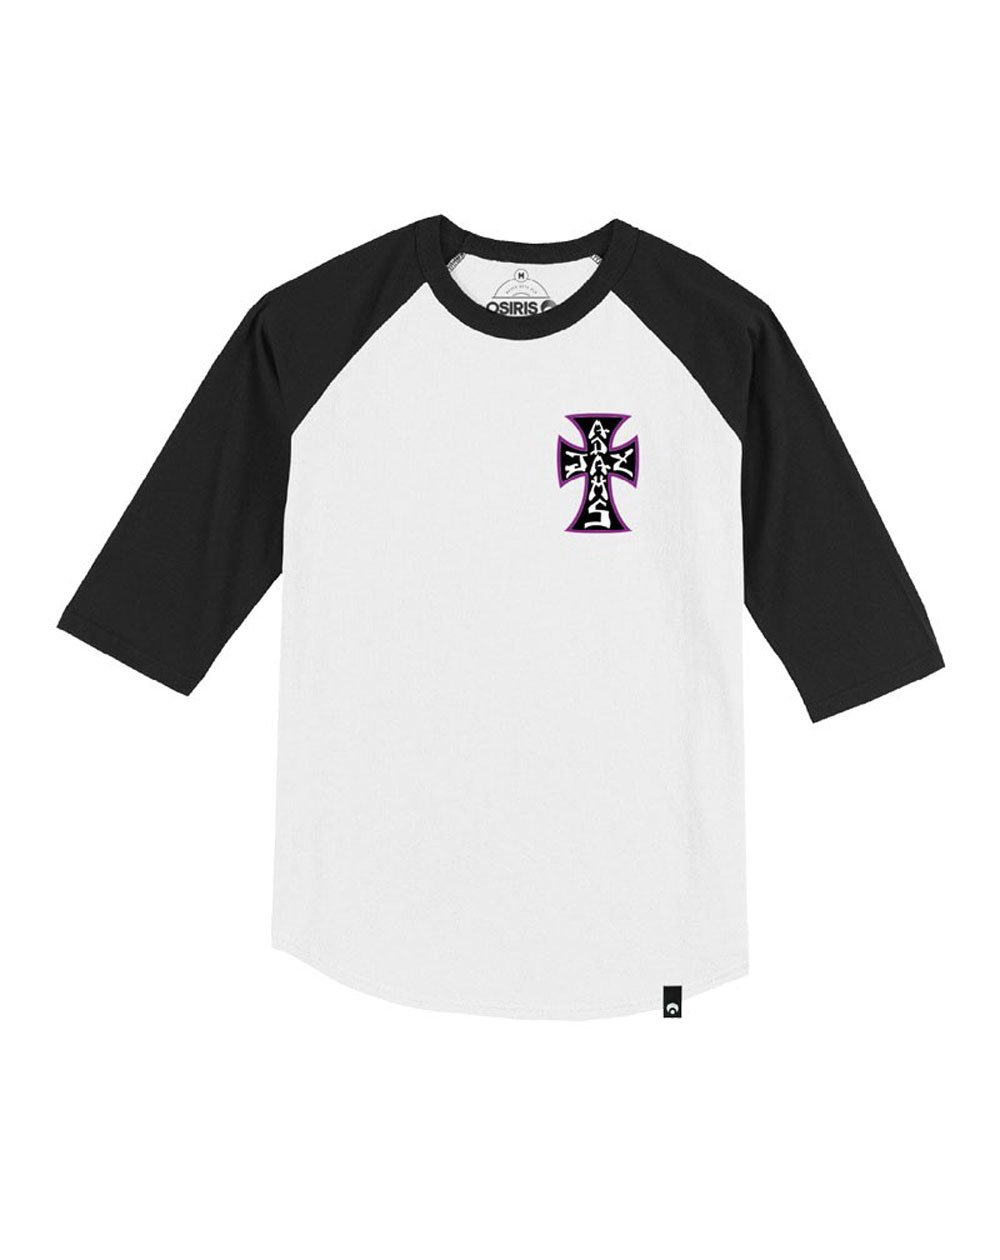 "Osiris Herren T-Shirt Jay Adams Forever ""The Cross"" Black/Purple"